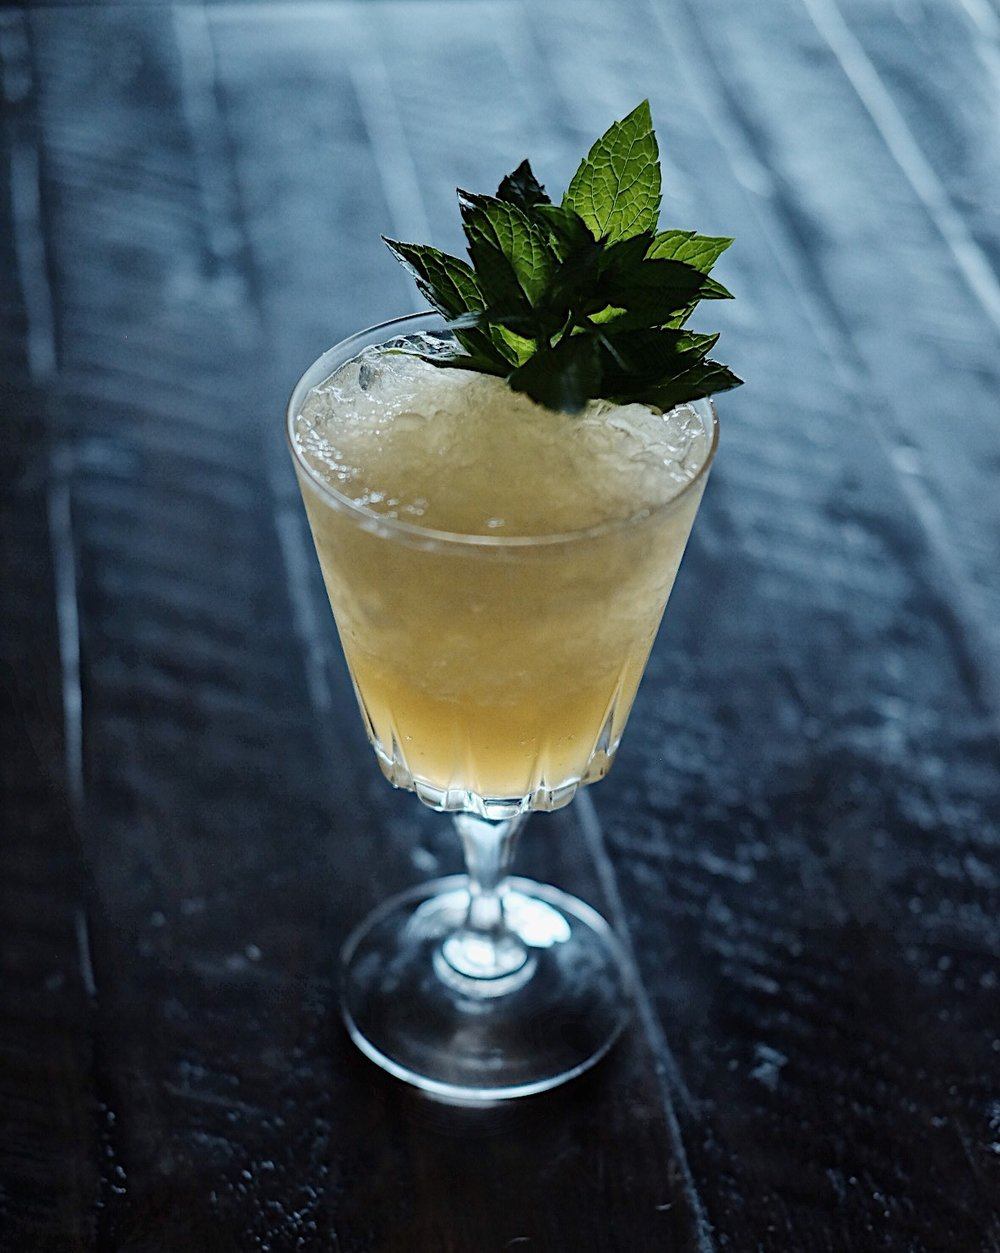 ingredients: - 1 1/2 oz blended scotch3/4 oz fresh lemon juice1/2 oz yellow chartreuse1/8 oz Galliano1/2 oz honey syrup4 dashes lavender bittersGarnish: fresh mint